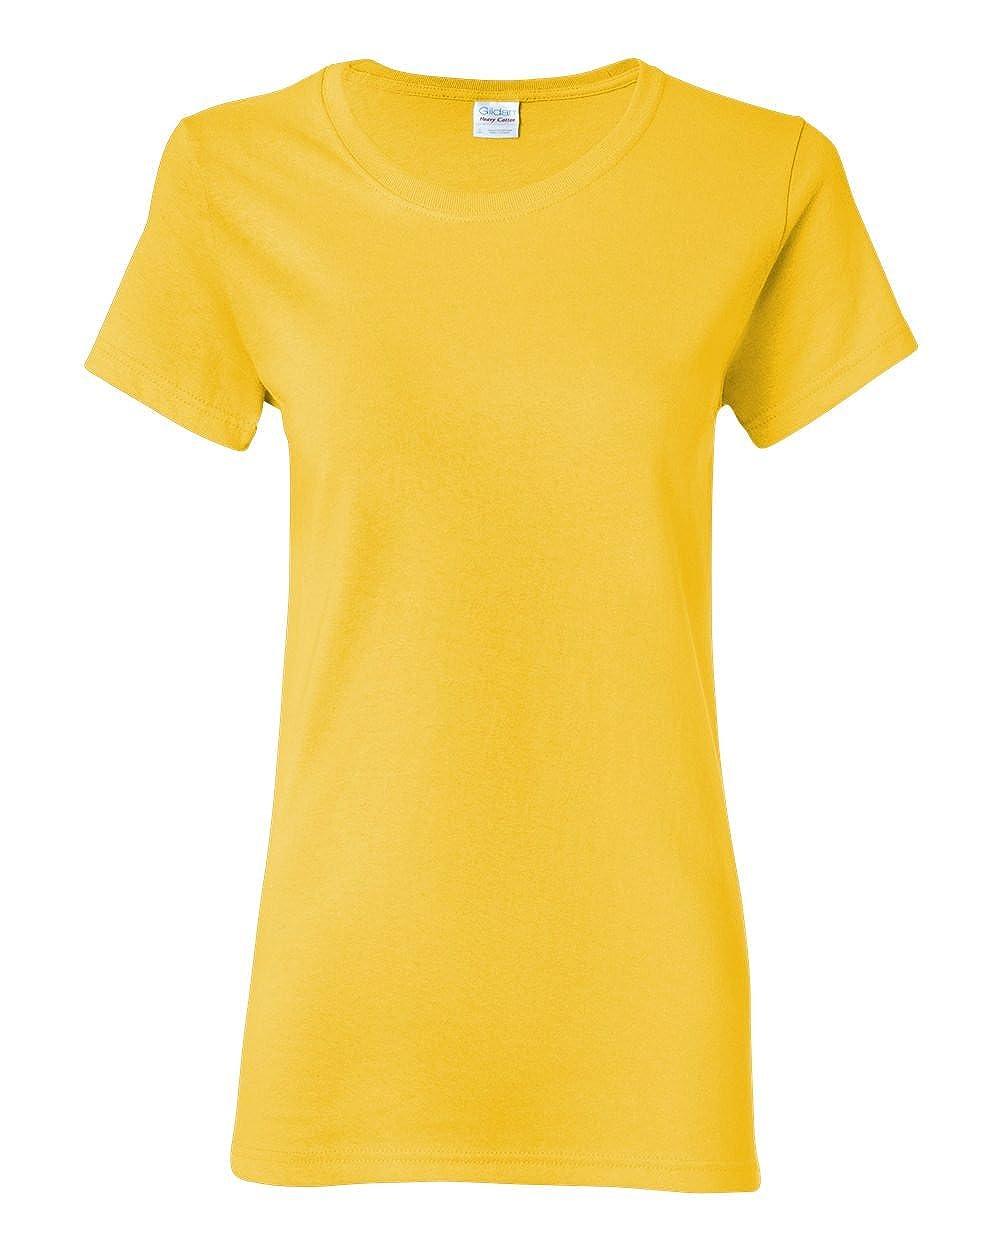 Daisy Gildan Womens 5.3 oz. Heavy Cotton Missy Fit TShirt G500L (Pack of 12)